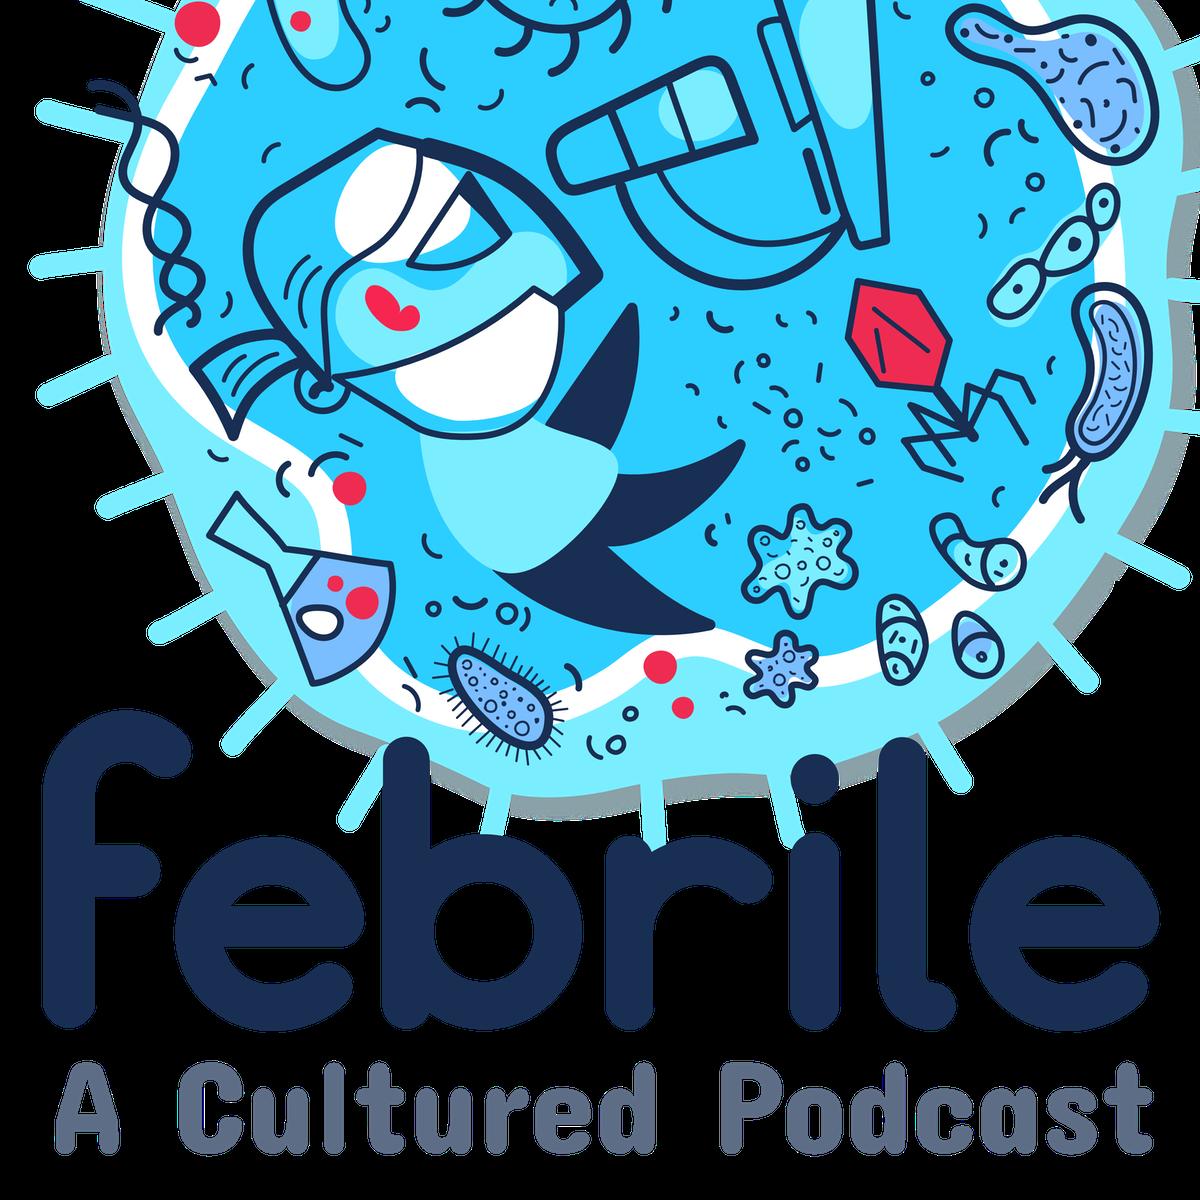 Febrile Logo - Part 2